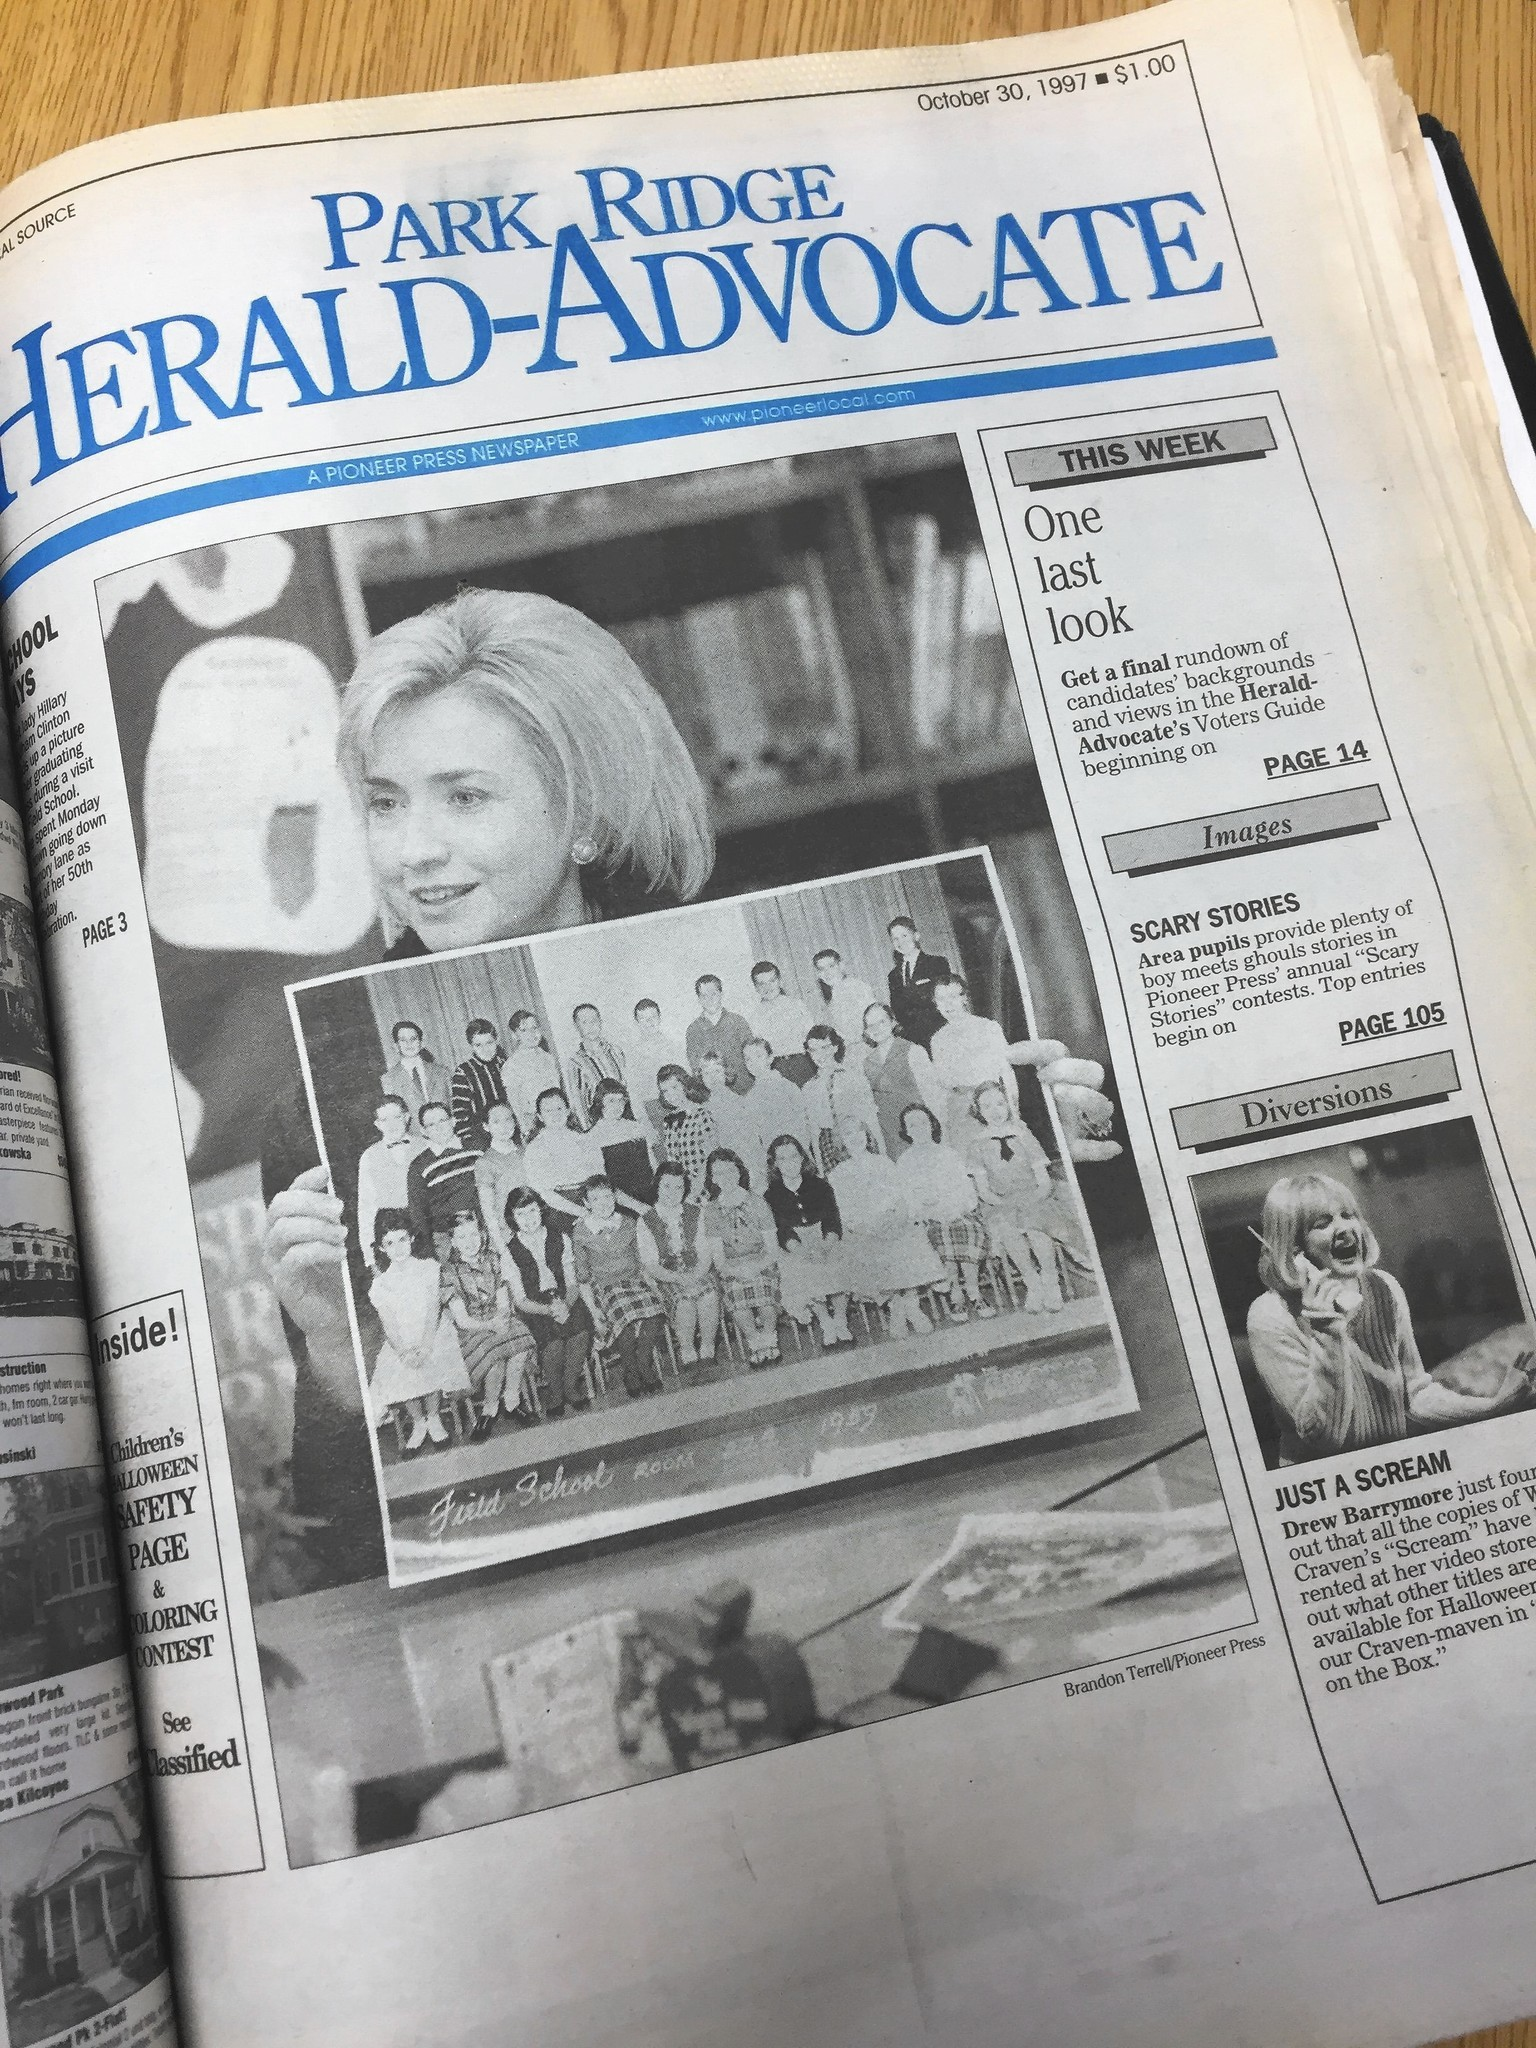 Hillary Clinton Celebrated 50th Birthday In Park Ridge 19